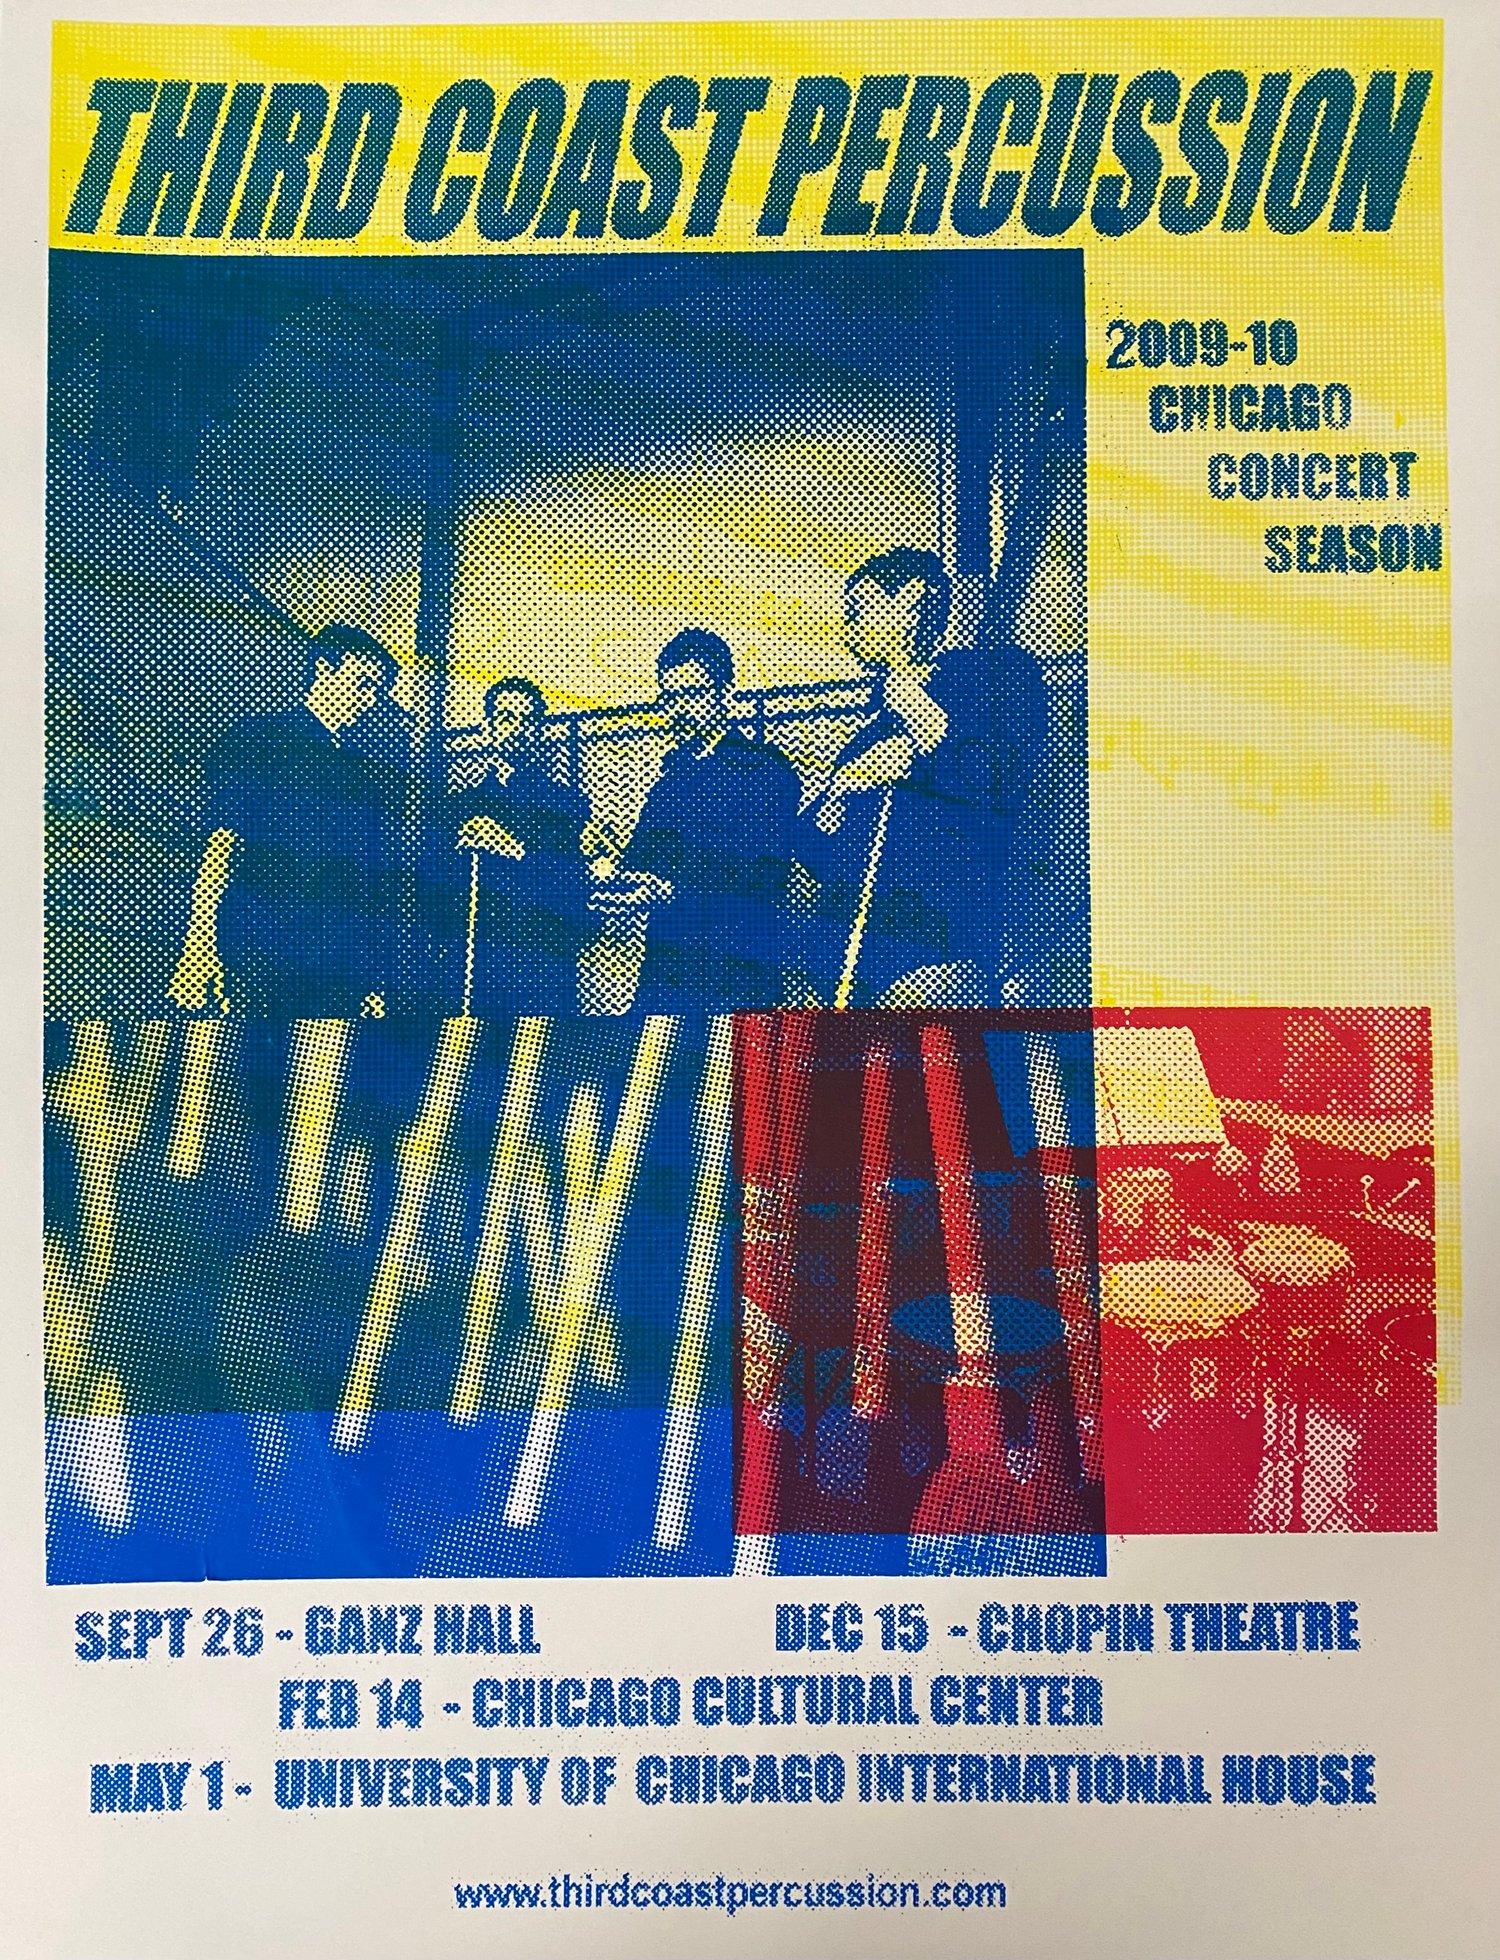 Image of Vintage Poster (2009-2010 season)